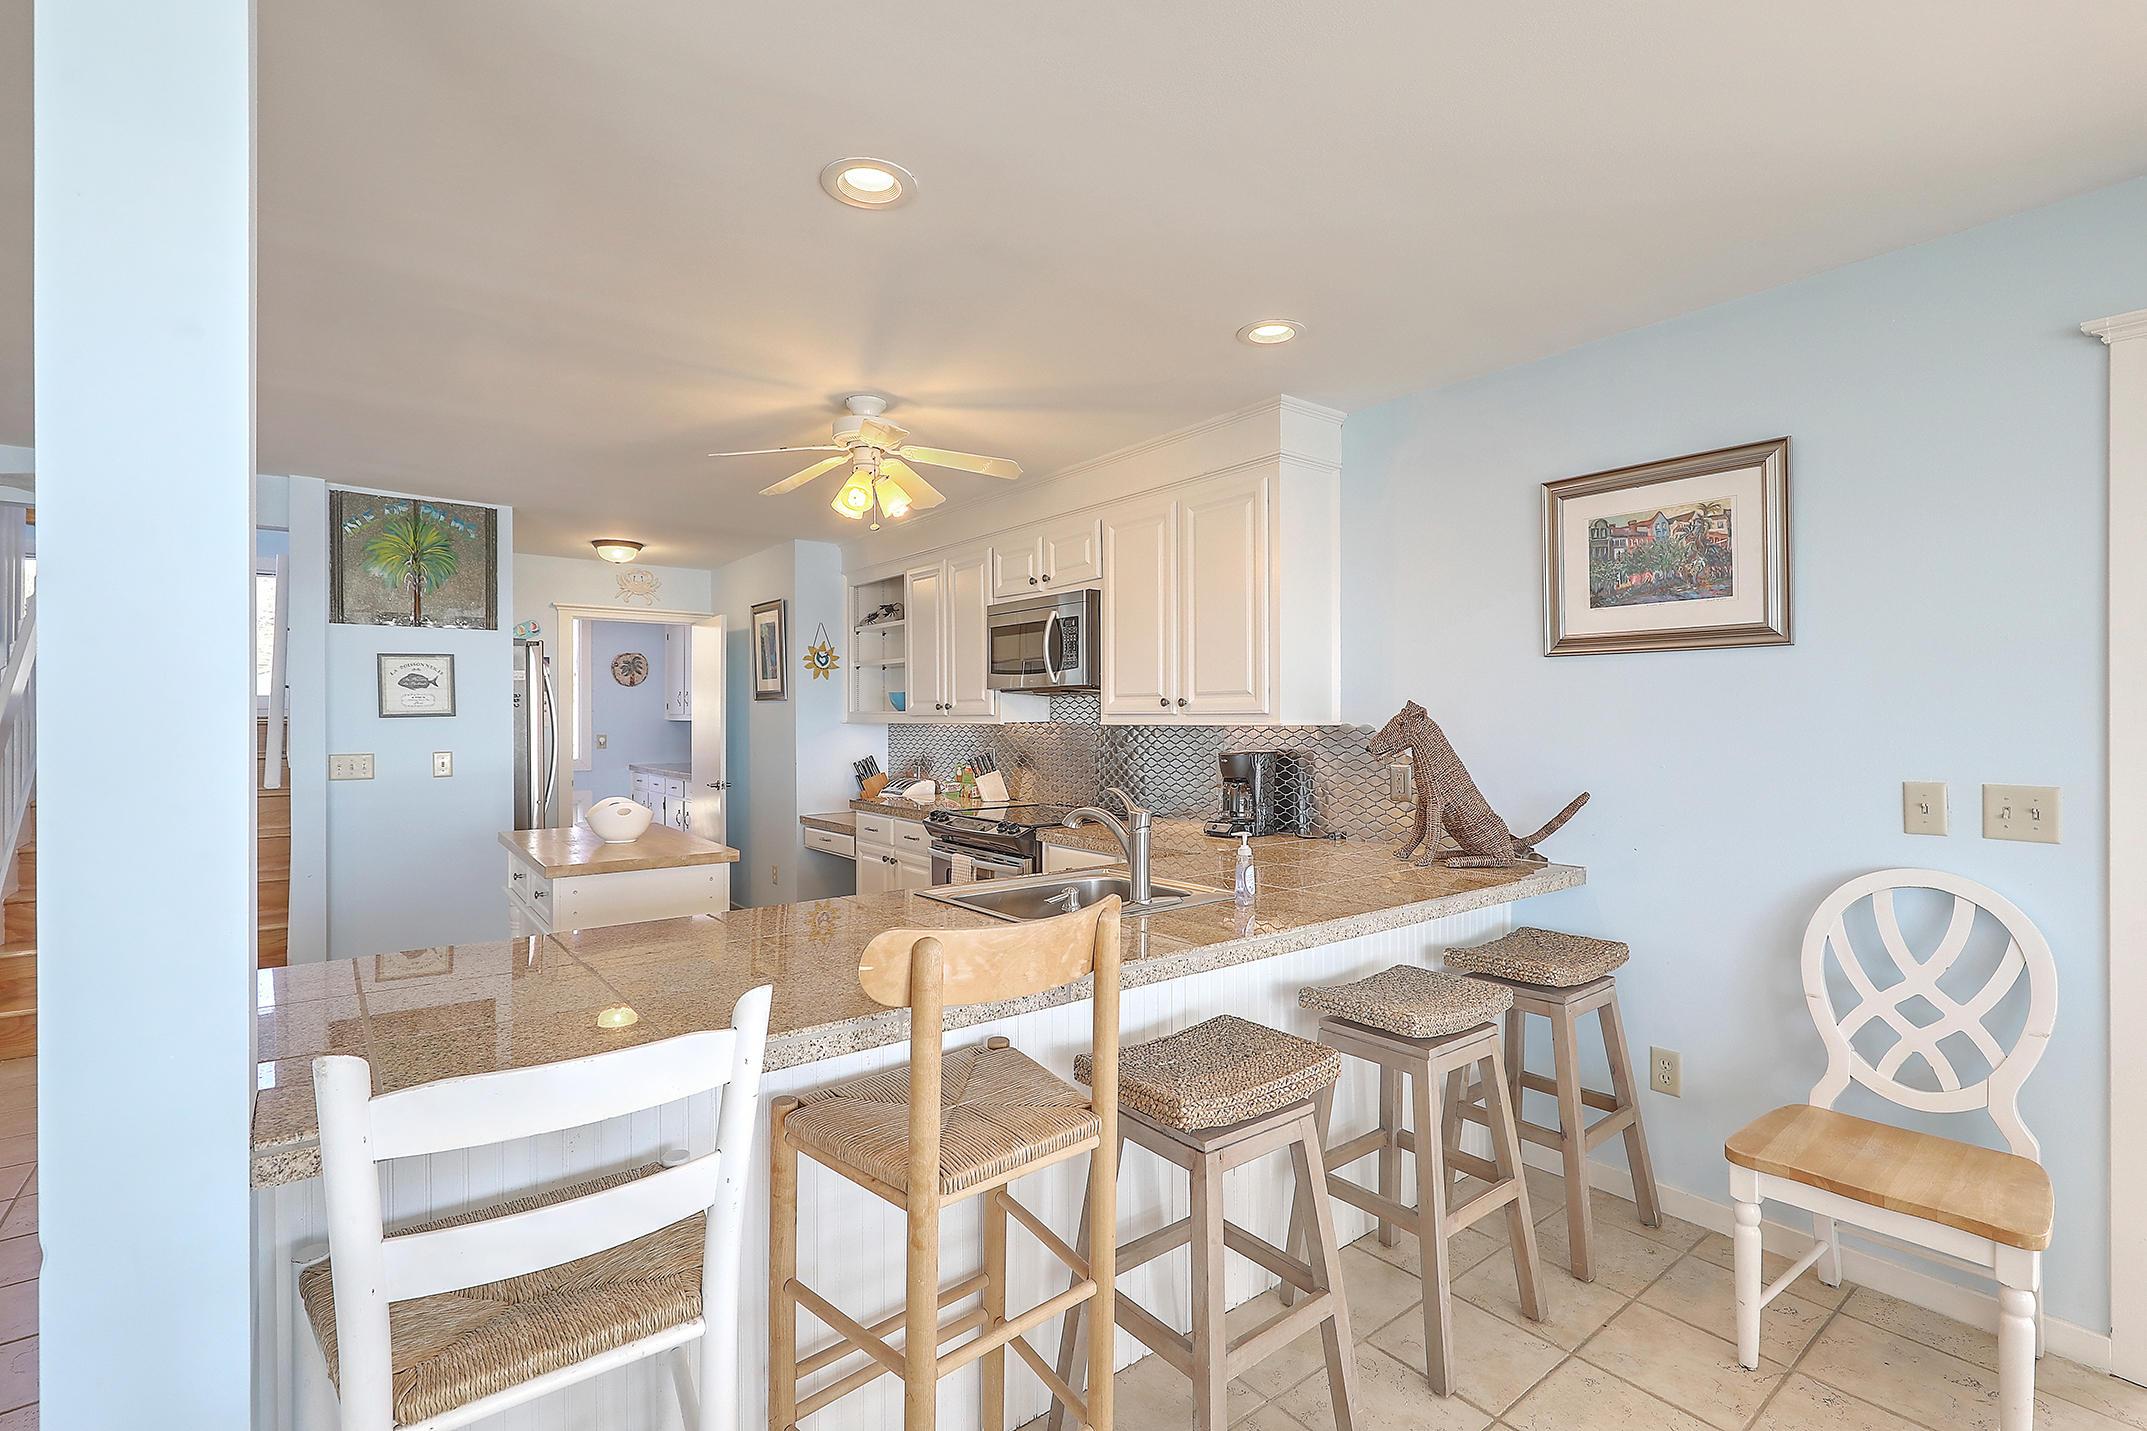 Wild Dunes Homes For Sale - 14 Beachwood East, Isle of Palms, SC - 12